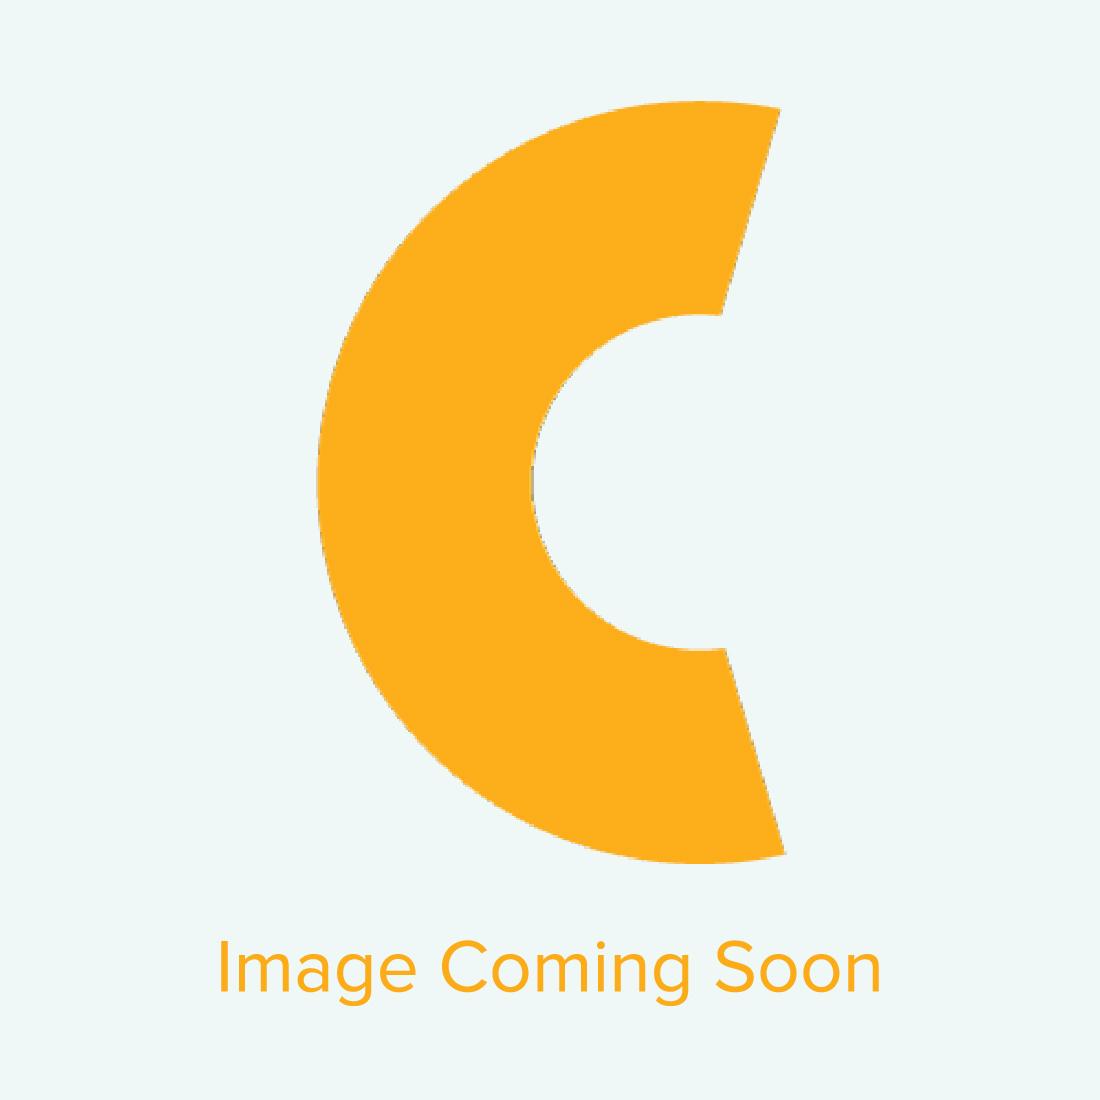 Vapor Apparel Fleece Ear Warmers - 54/case - OVERSTOCK